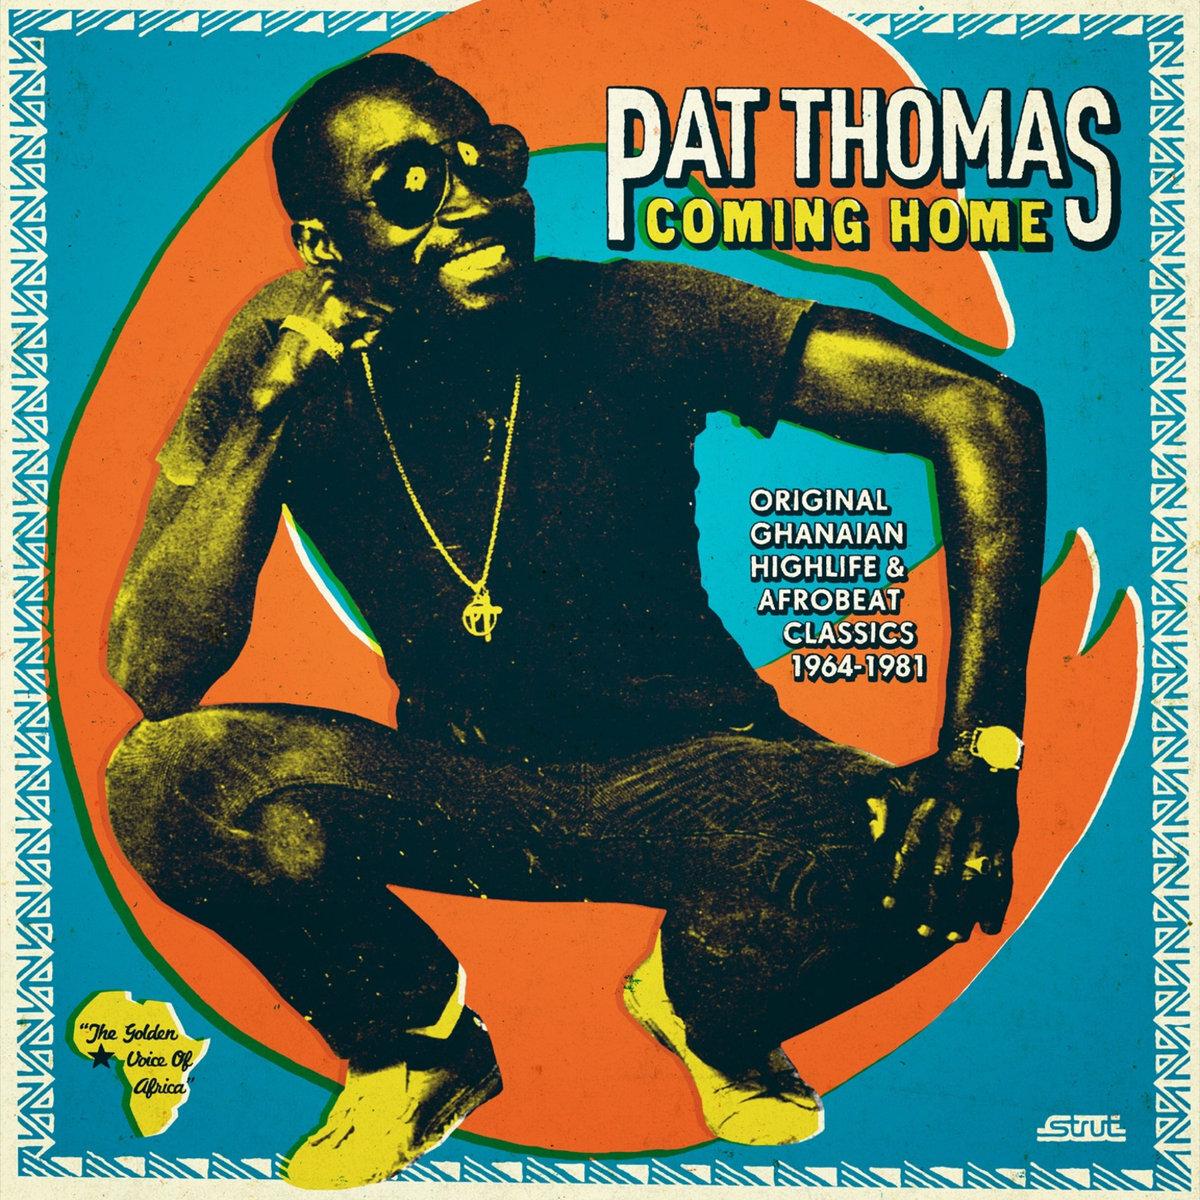 PAT-THOMAS-COMING-HOME.jpg